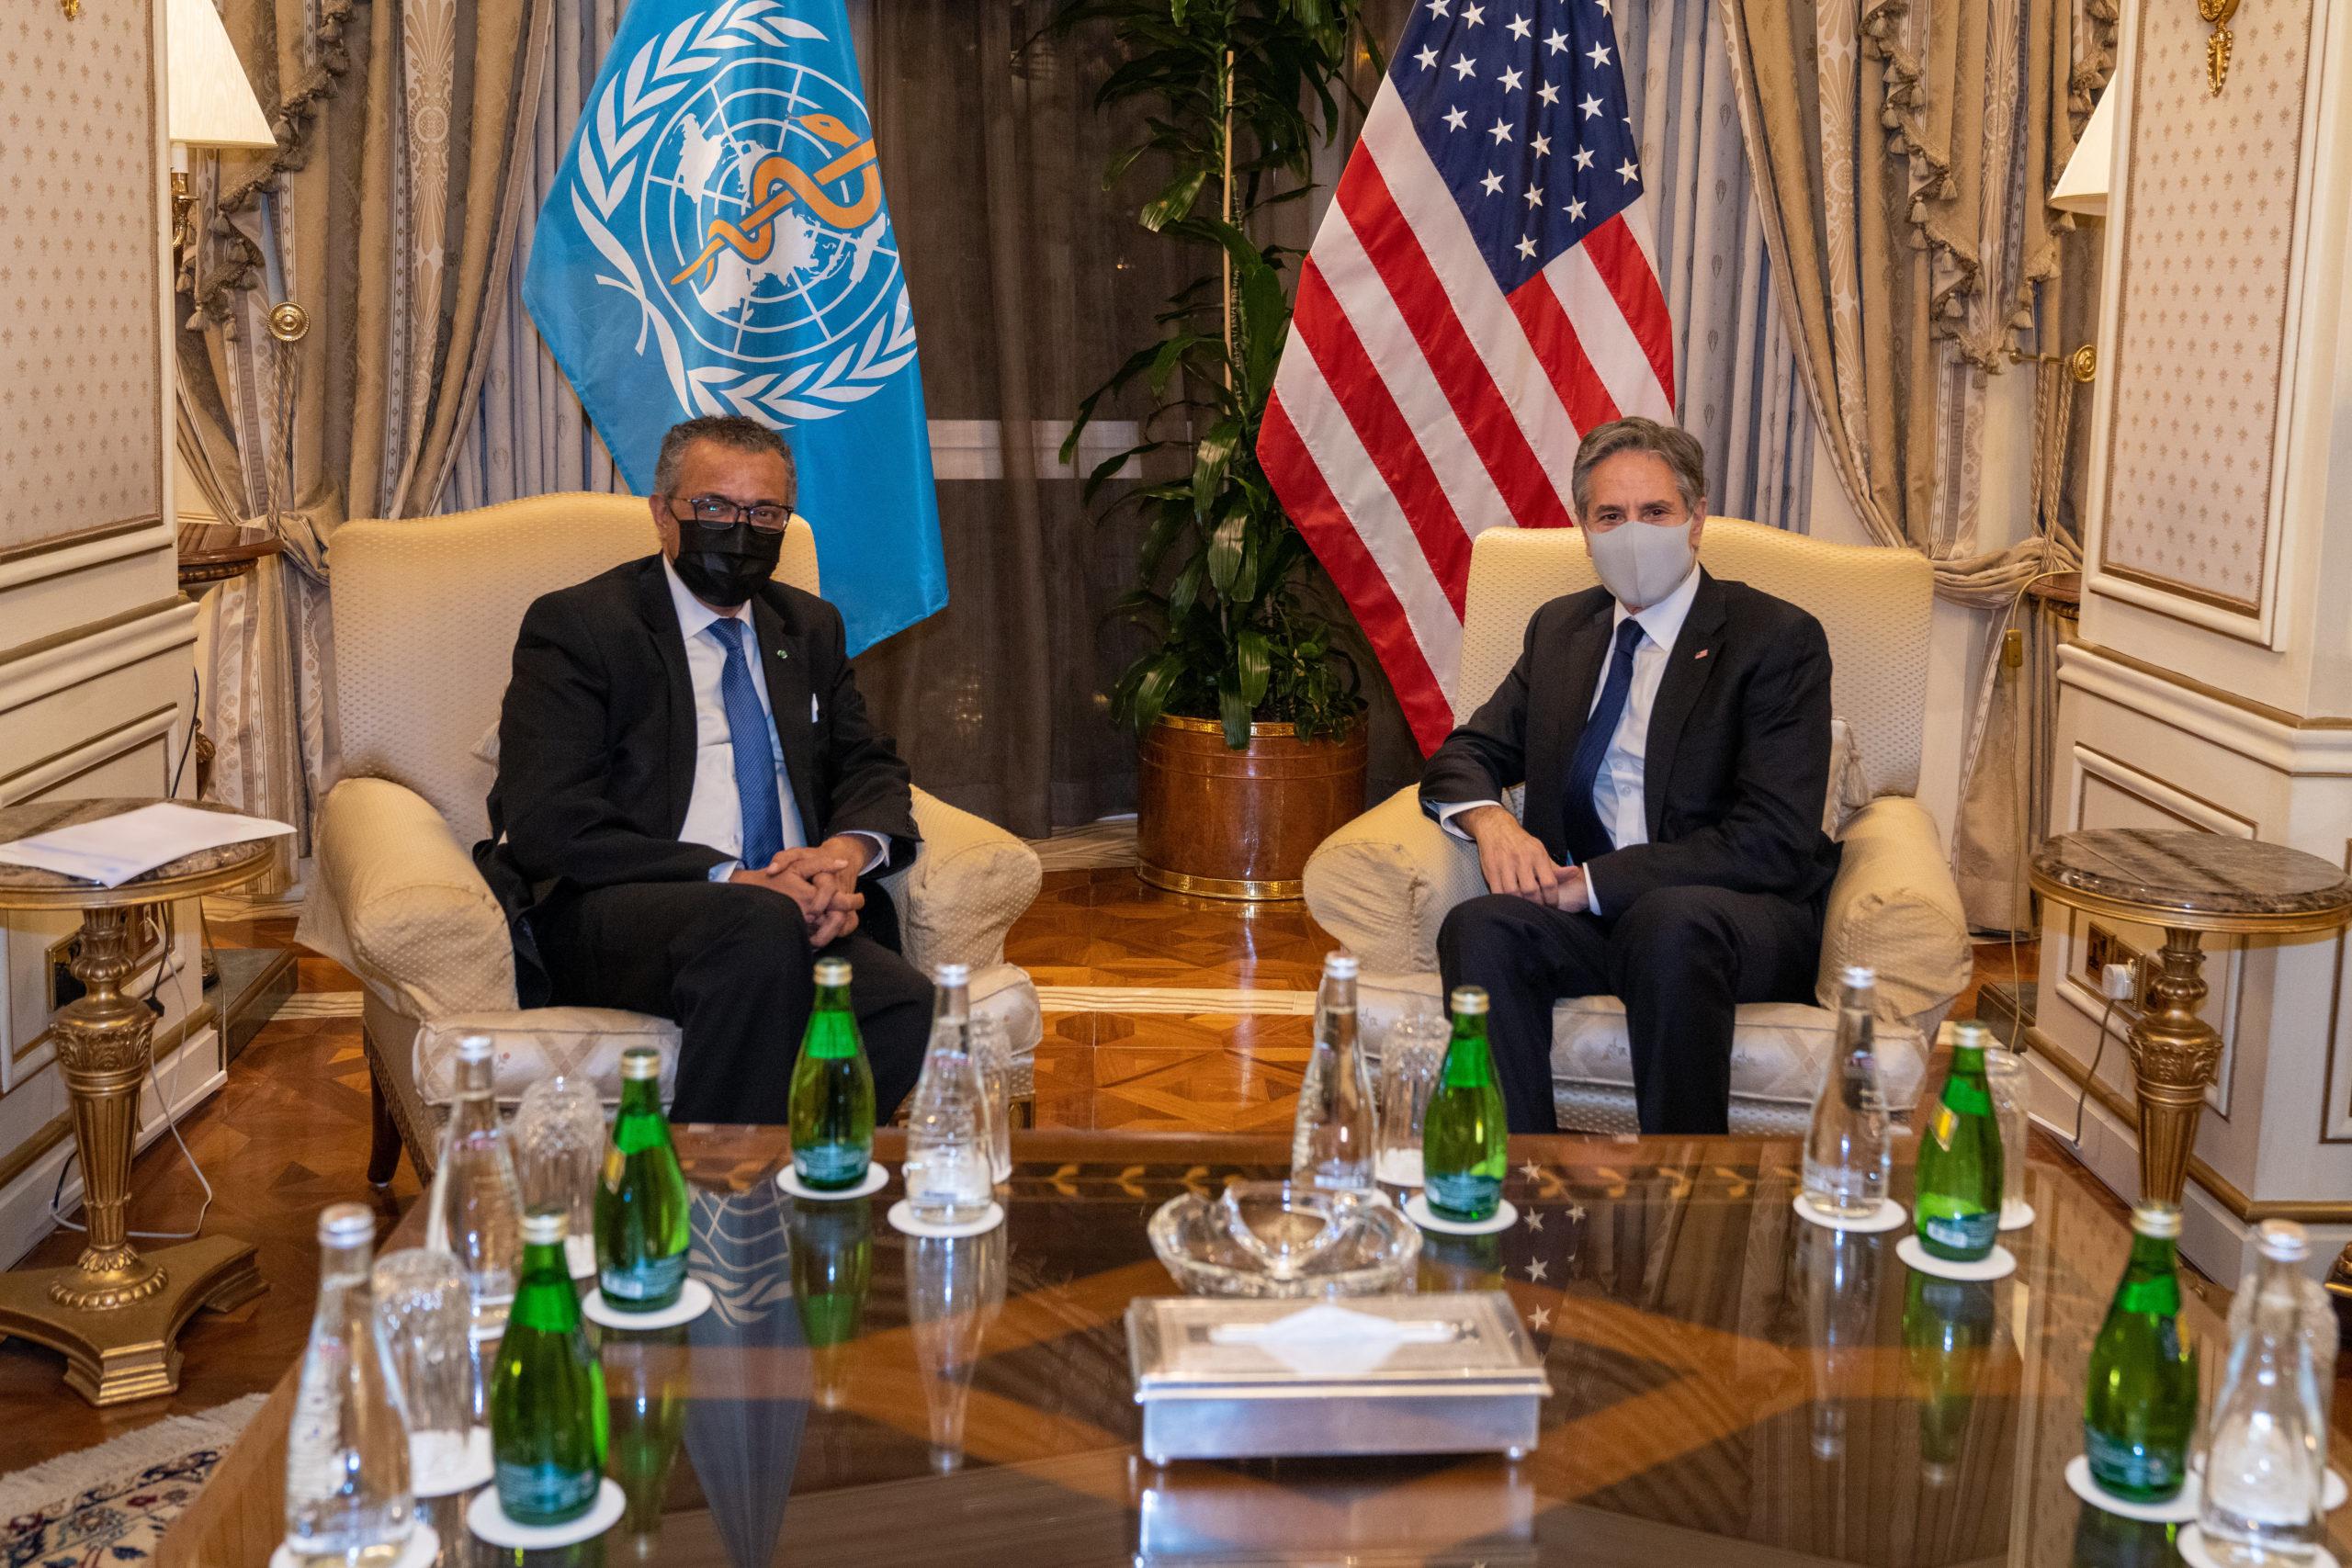 WHO:n pääjohtaja Tedros Adhanom Ghebreyesus ja Yhdysvaltojen ulkoministeri Antony Blinken keskustelivat WHO:n uudistamisesta heinäkuussa. Kuva: Flickr/U.S. Department of State